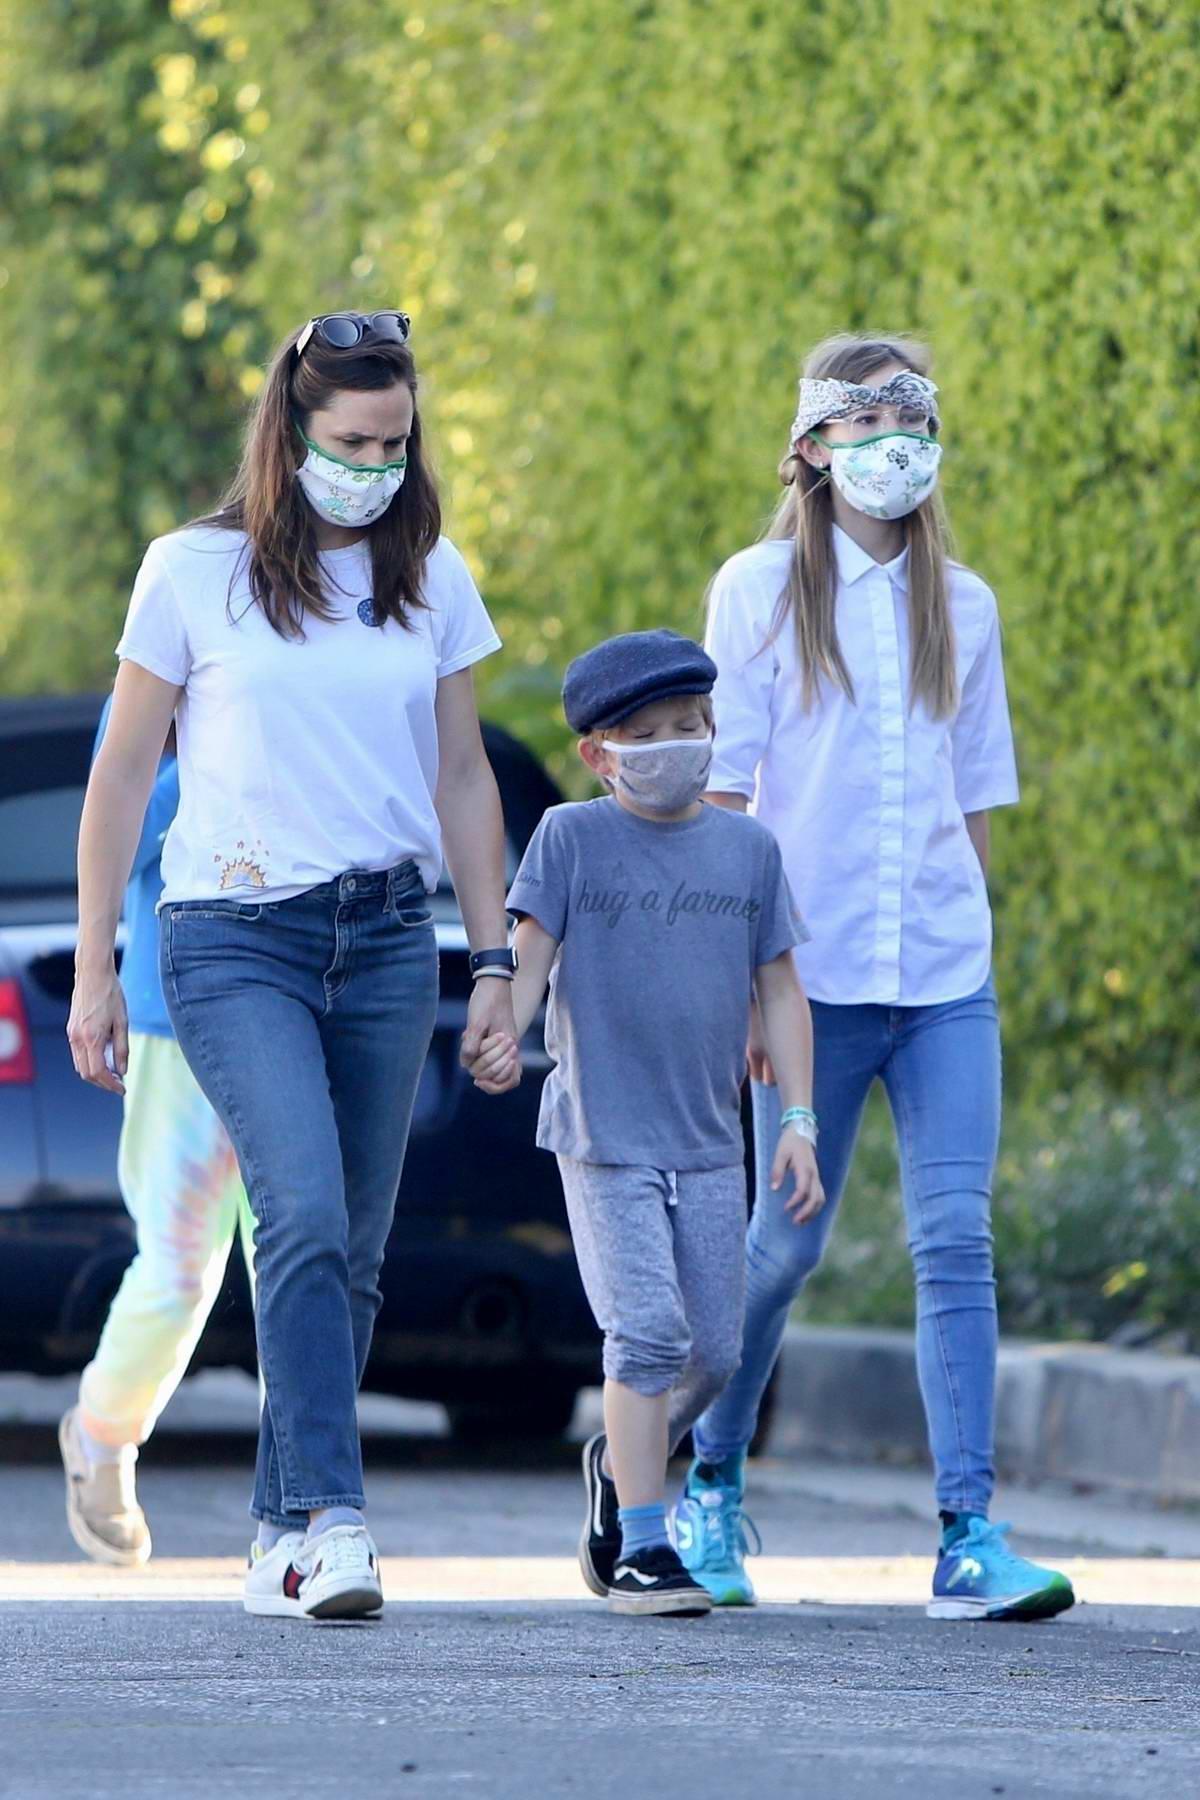 Jennifer Garner and her kids seen wearing masks while enjoying a hike in Brentwood, California